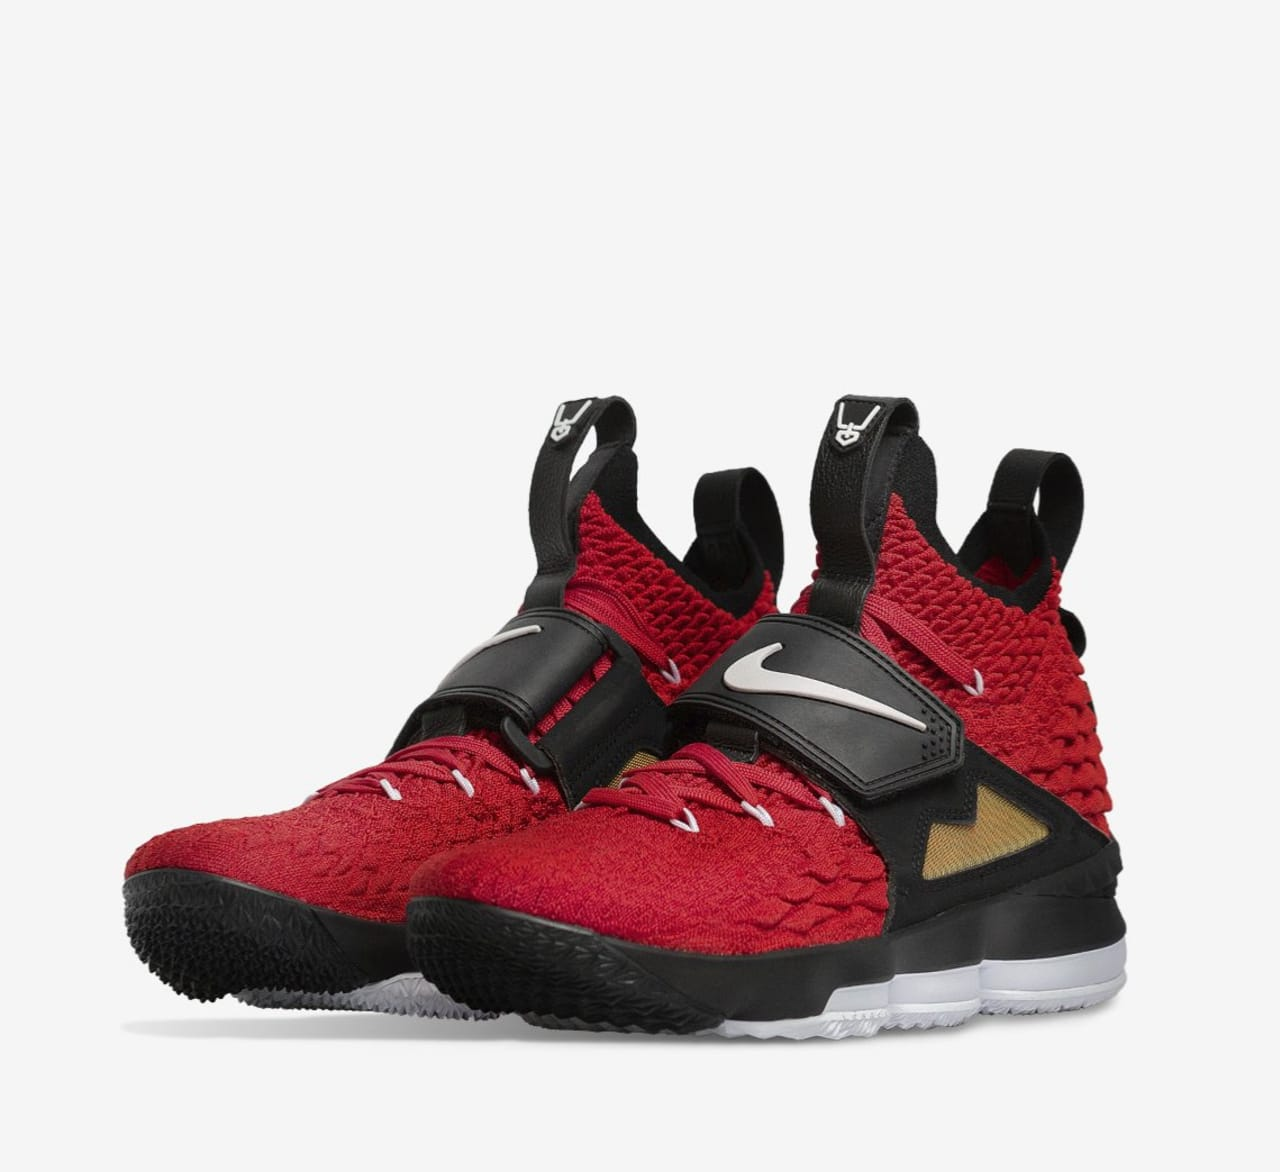 aa22b077680 Nike LeBron 15 'Red Diamond Turf' #LeBronWatch Still Available ...